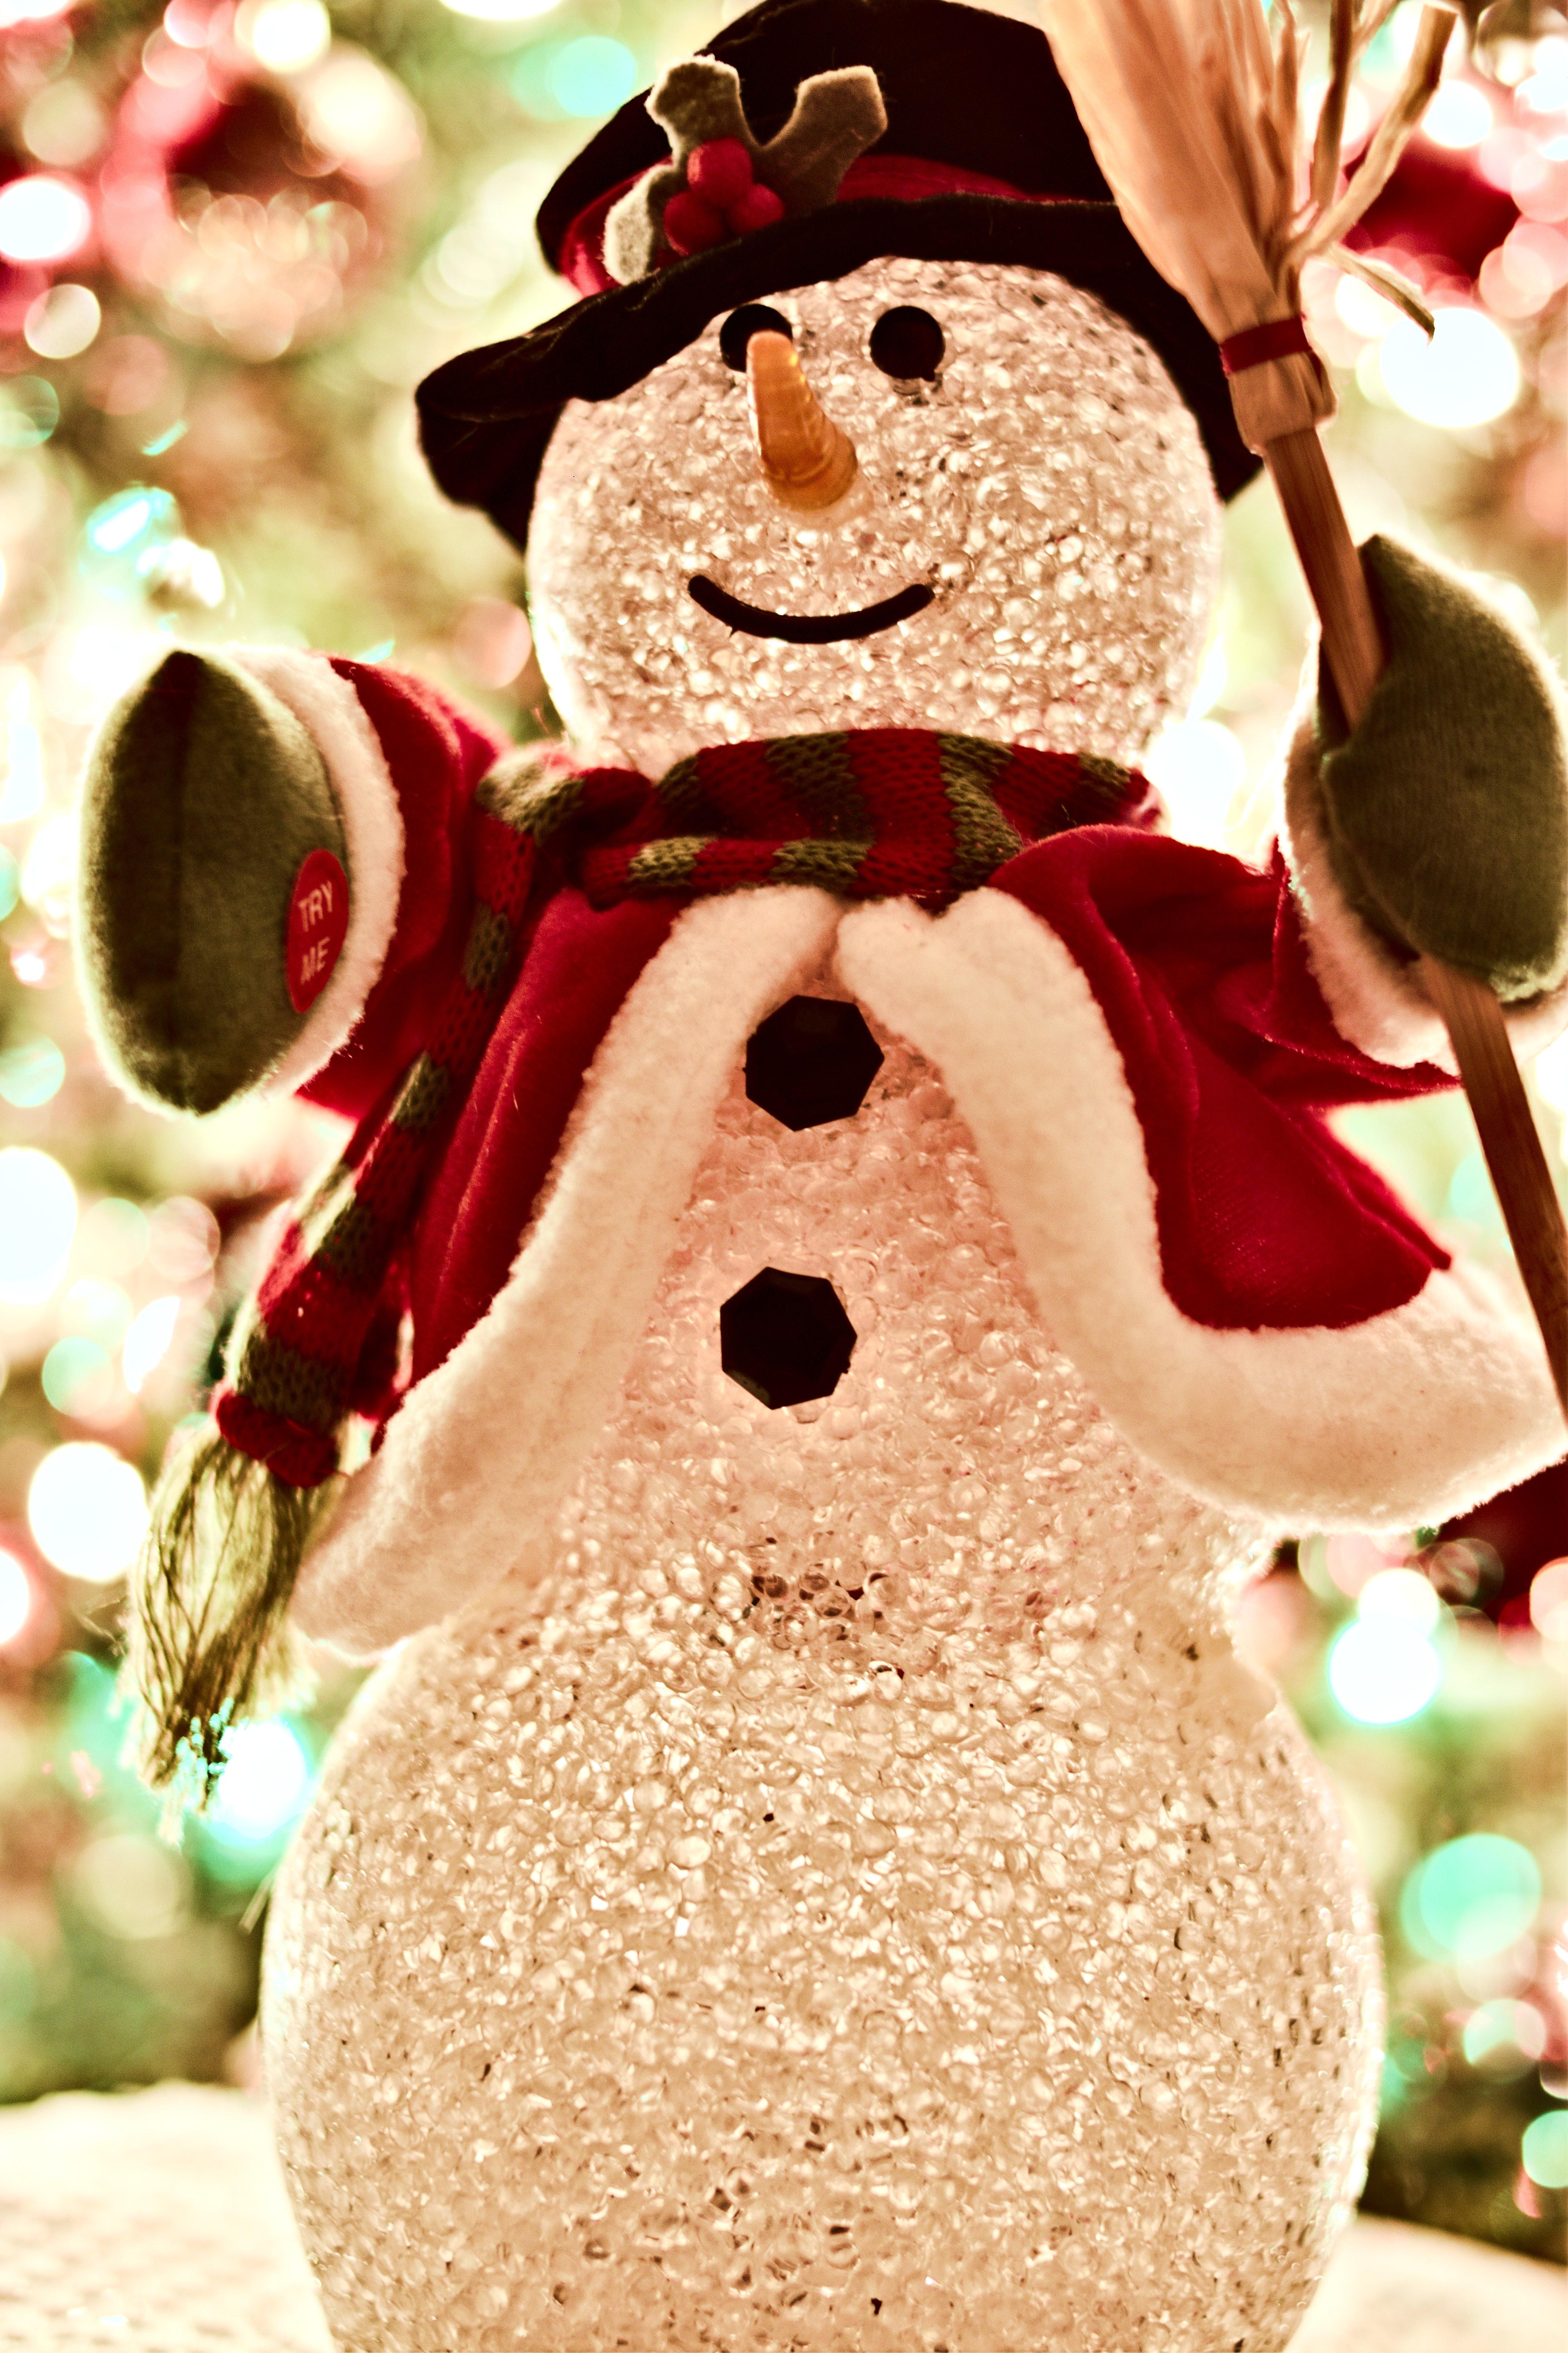 Snowman figurine photo